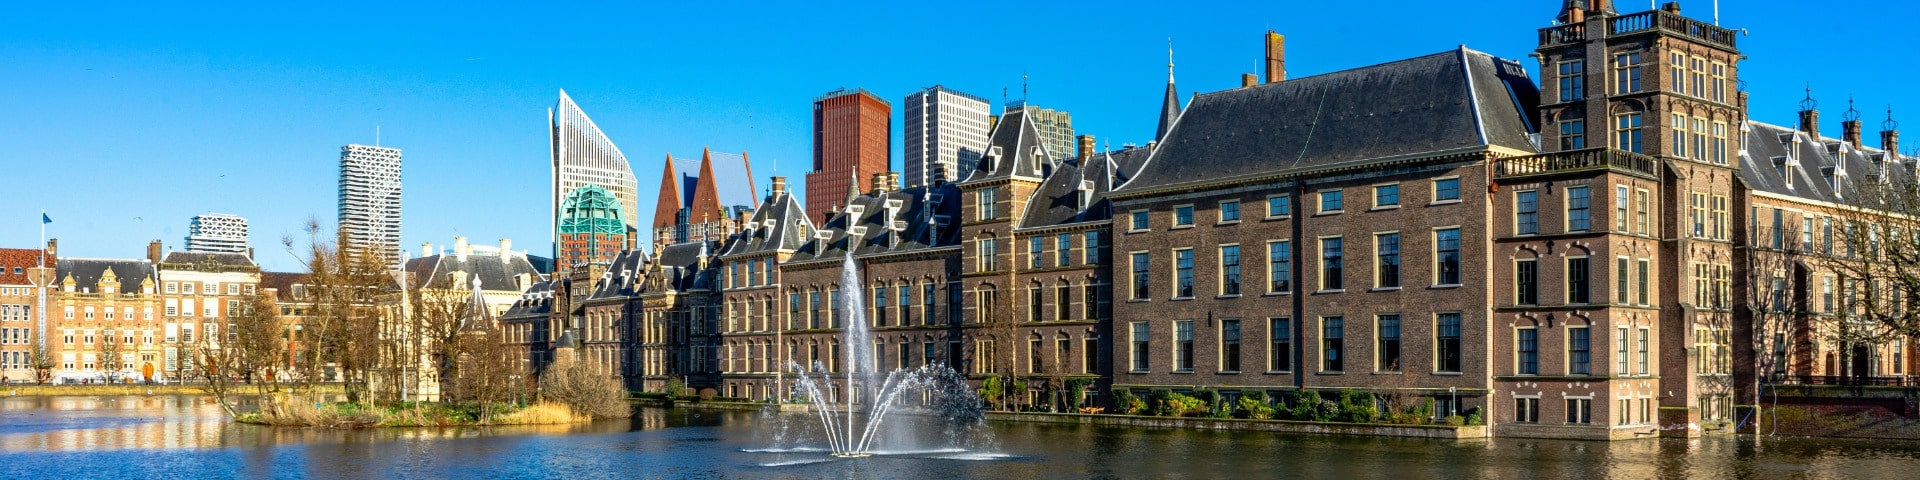 Binnenhof with pond in front